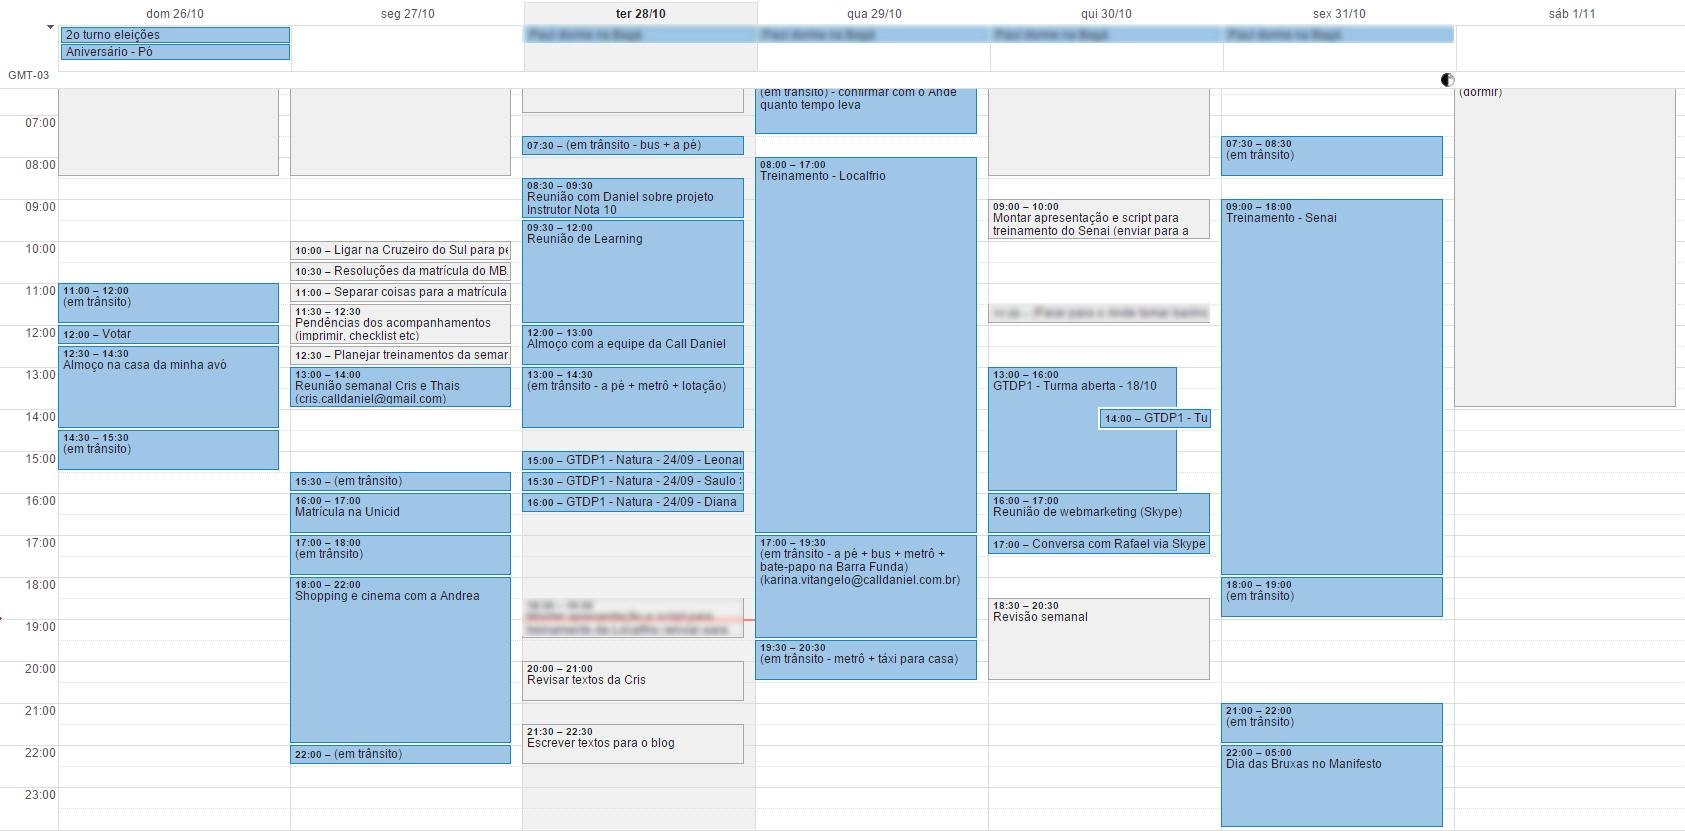 agenda-semana-27